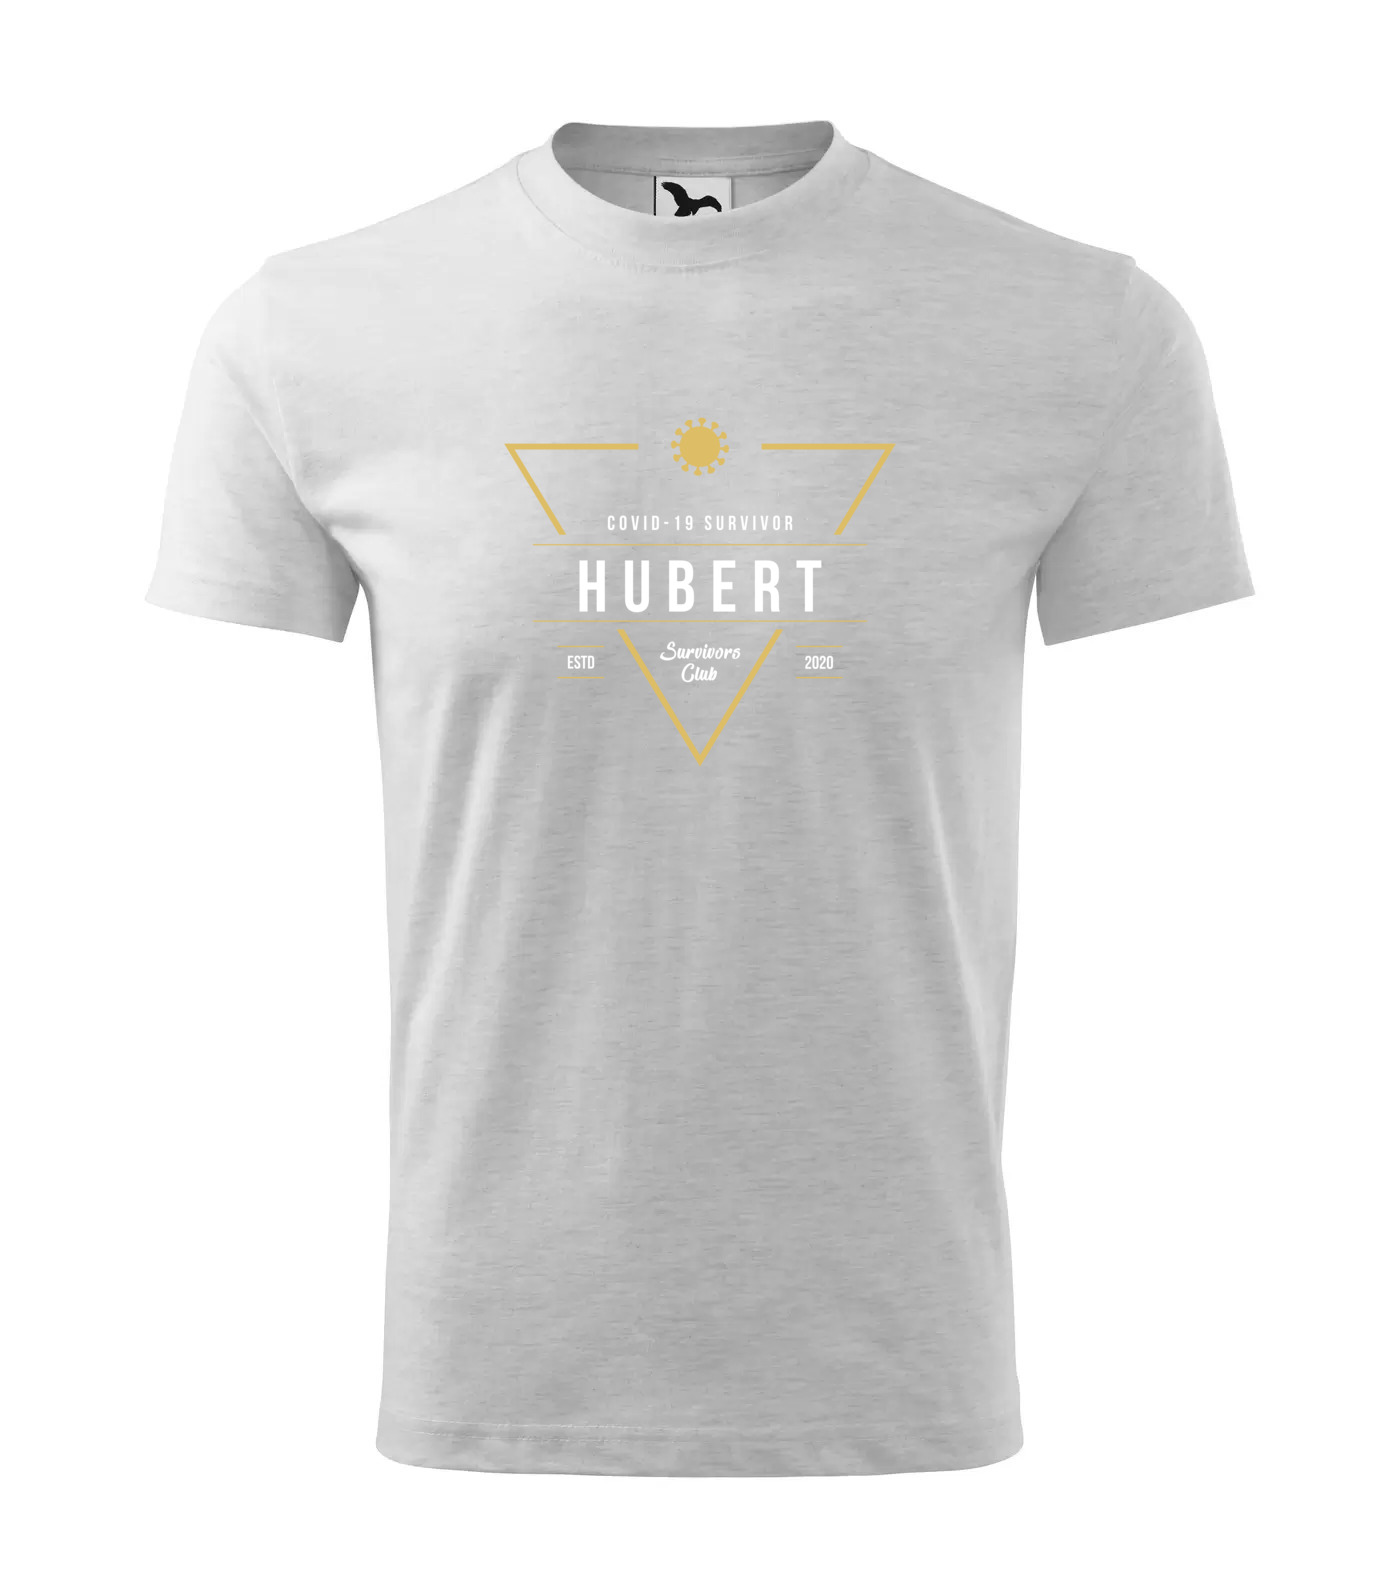 Tričko Survivor Club Hubert